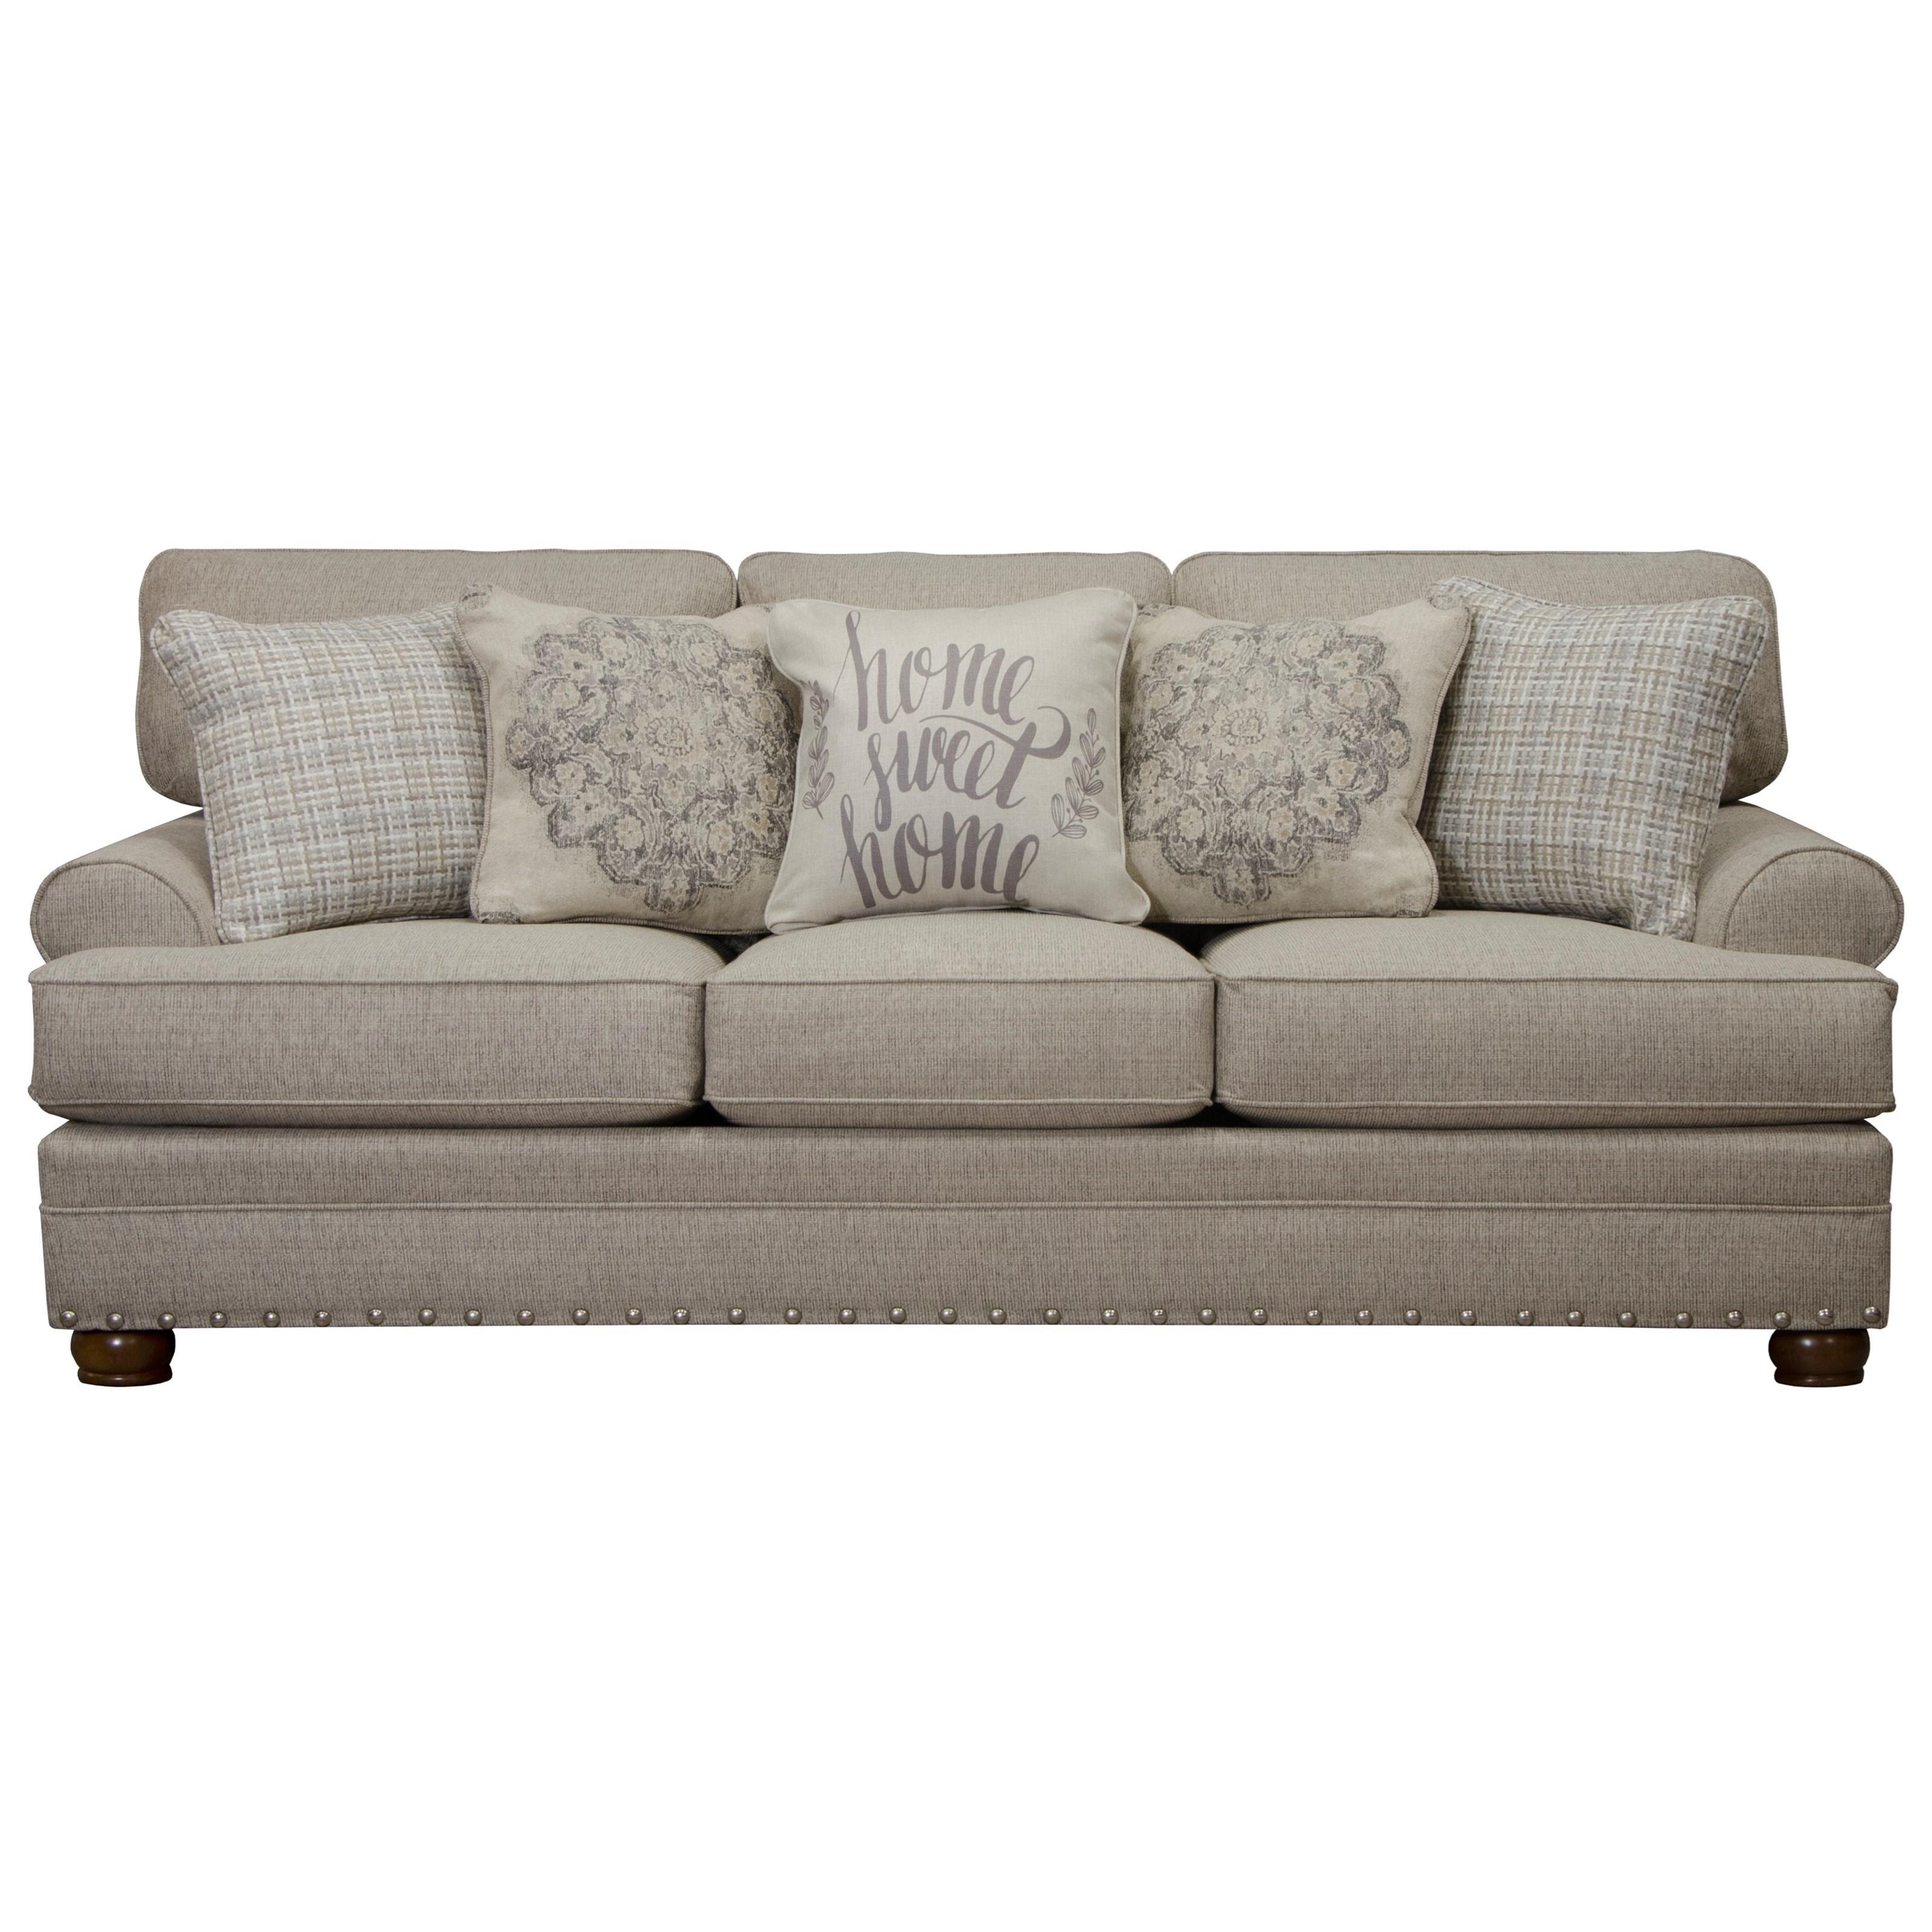 Farmington Sofa by Jackson Furniture at Standard Furniture